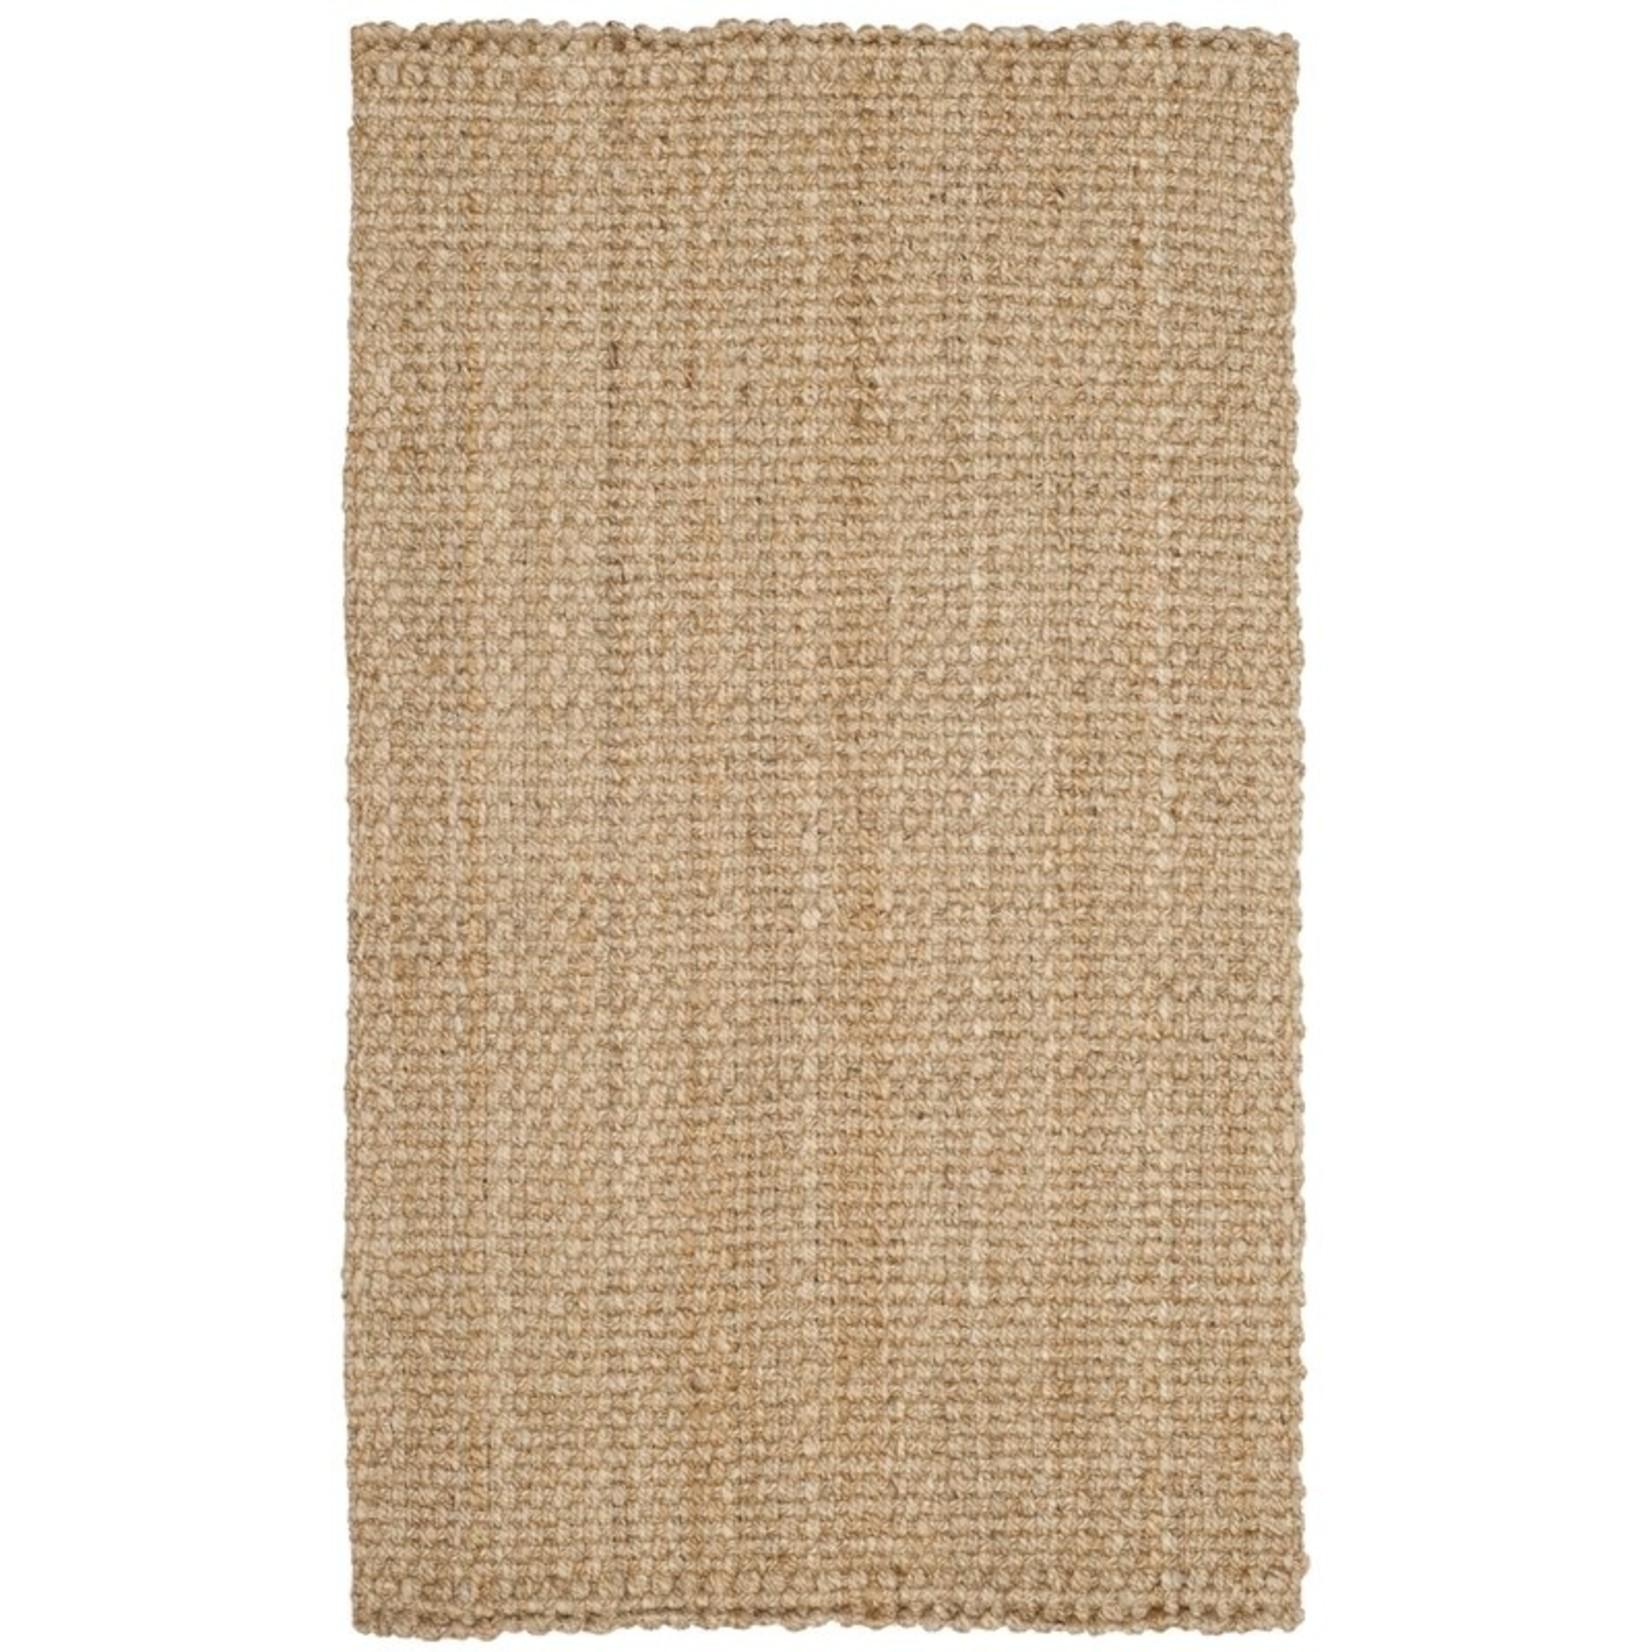 *4' x 6' - Addilyn Handwoven Jute/Sisal Natural Area Rug